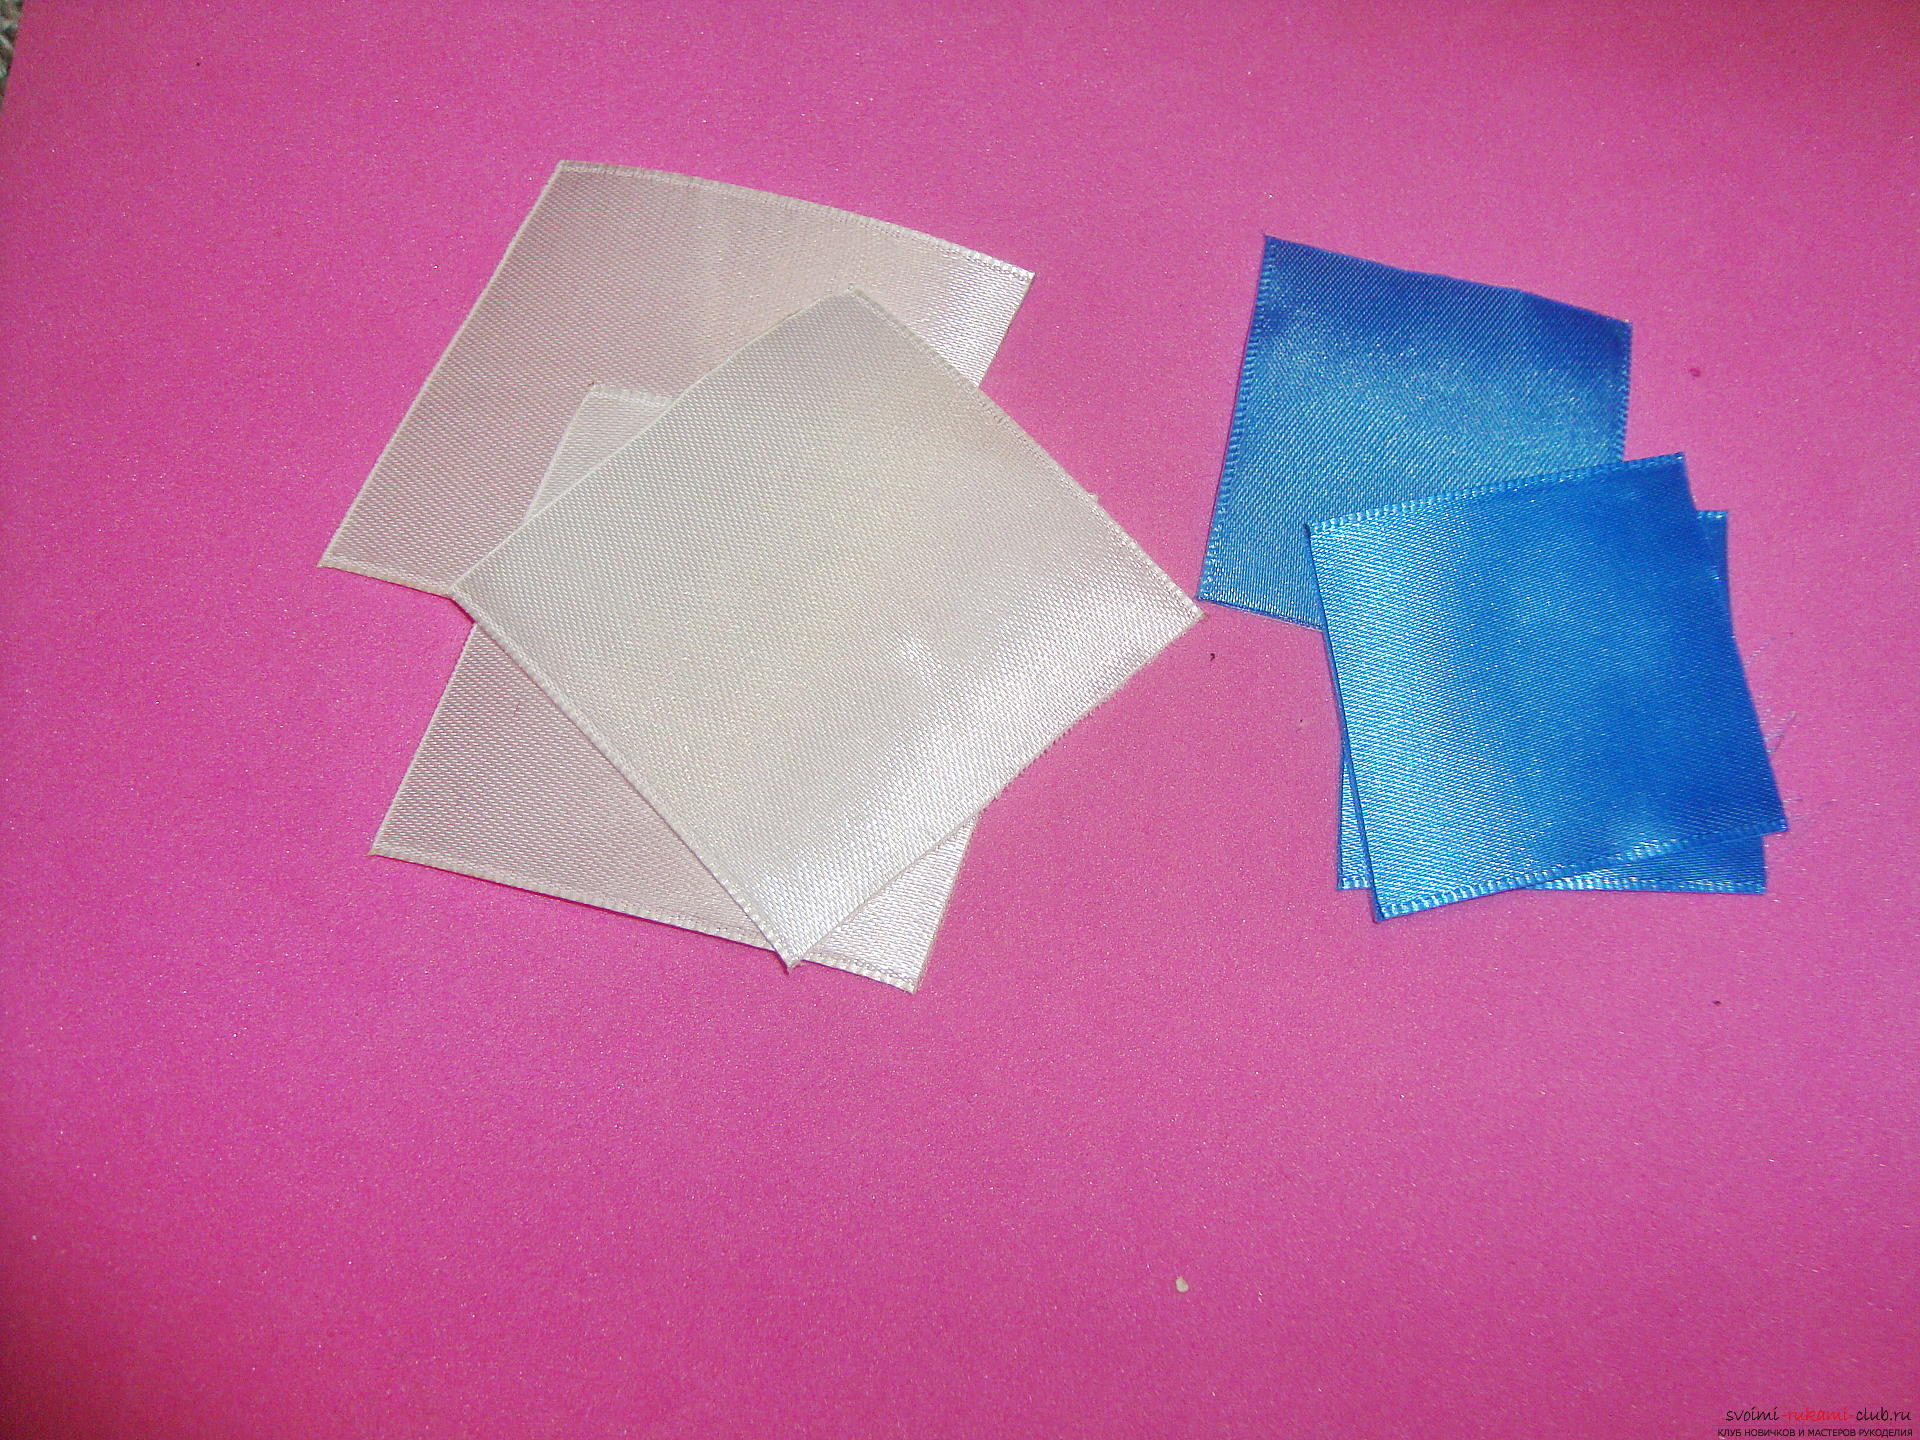 Фото инструкция по изготовлению заколки из лент голубого цвета в технике канзаши. Фото №3